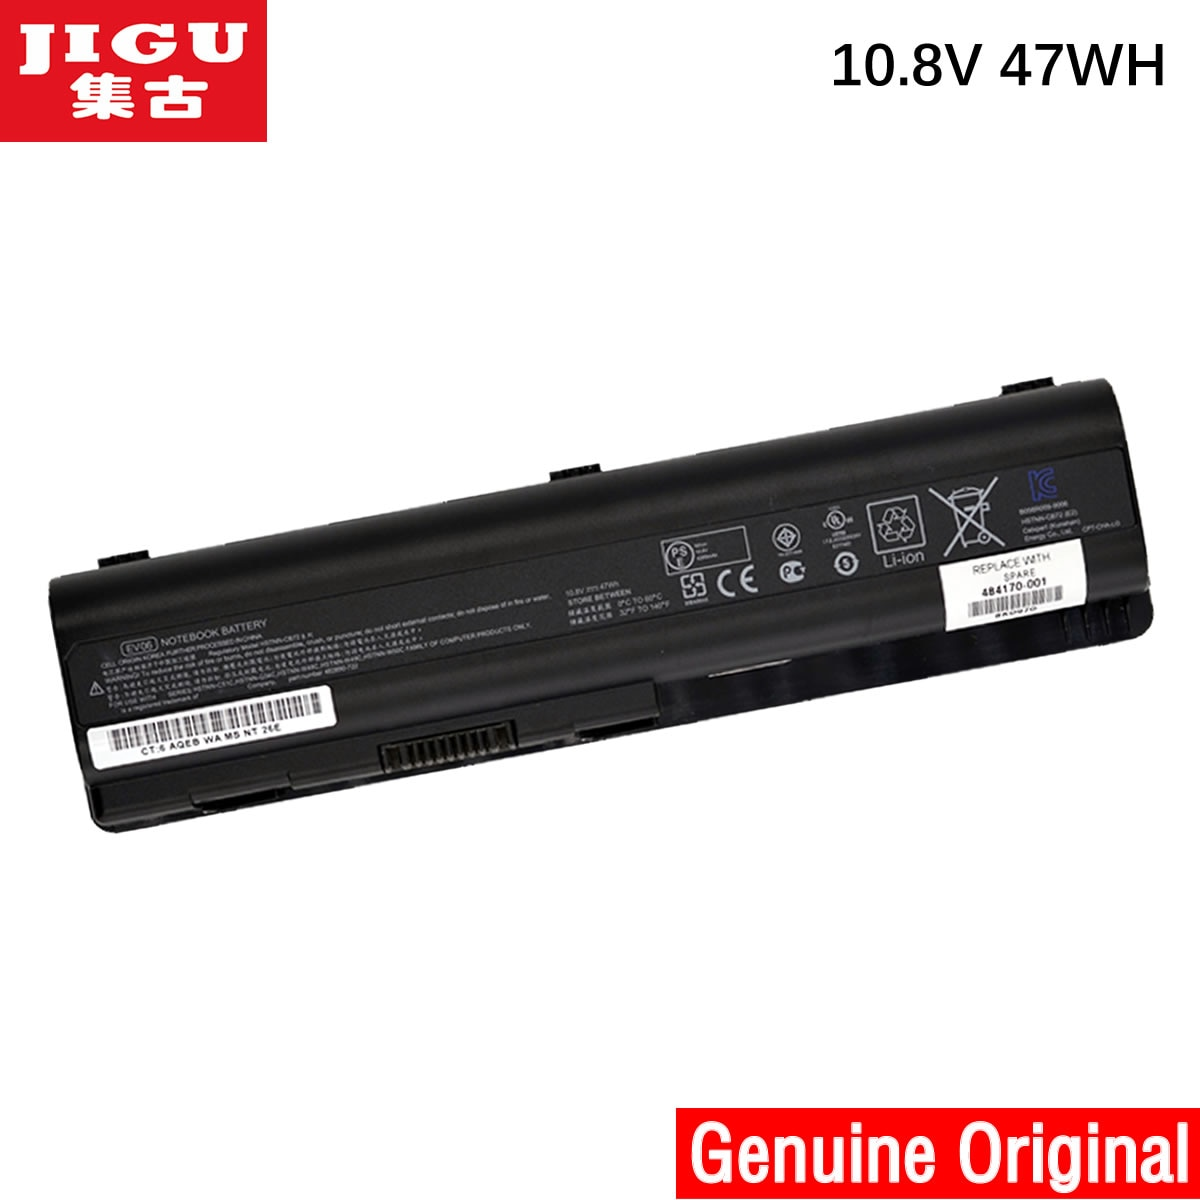 JIGU 487296-001 487354-001 497694-001 497694-002 497695-001 498482-001 500028-131 Original Laptop Ba